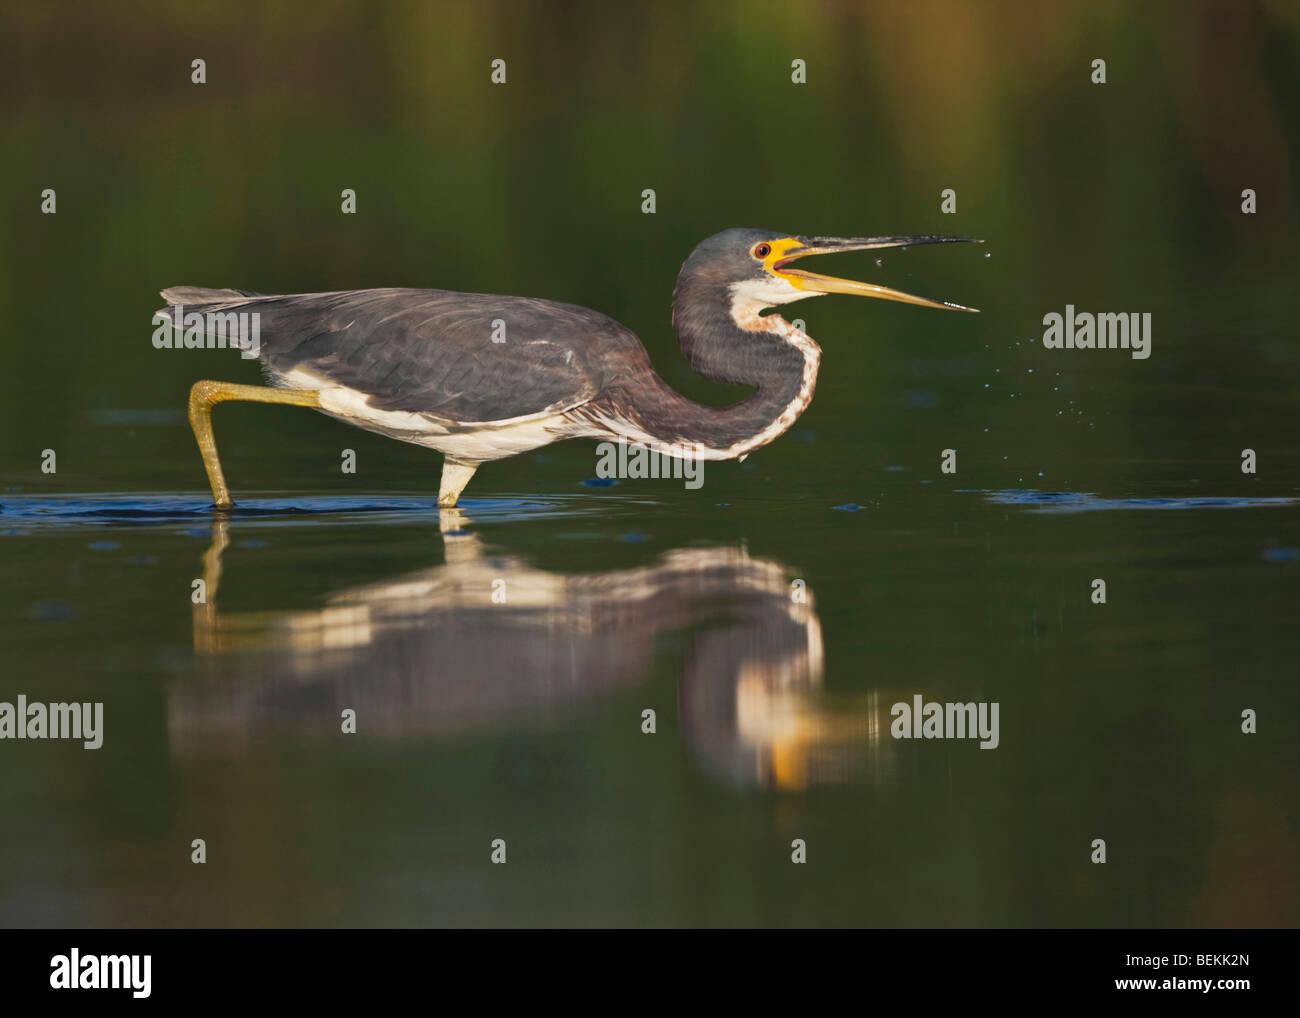 Tricolored Heron (Egretta tricolor), adult fishing, Sinton, Corpus Christi, Coastal Bend, Texas, USA - Stock Image